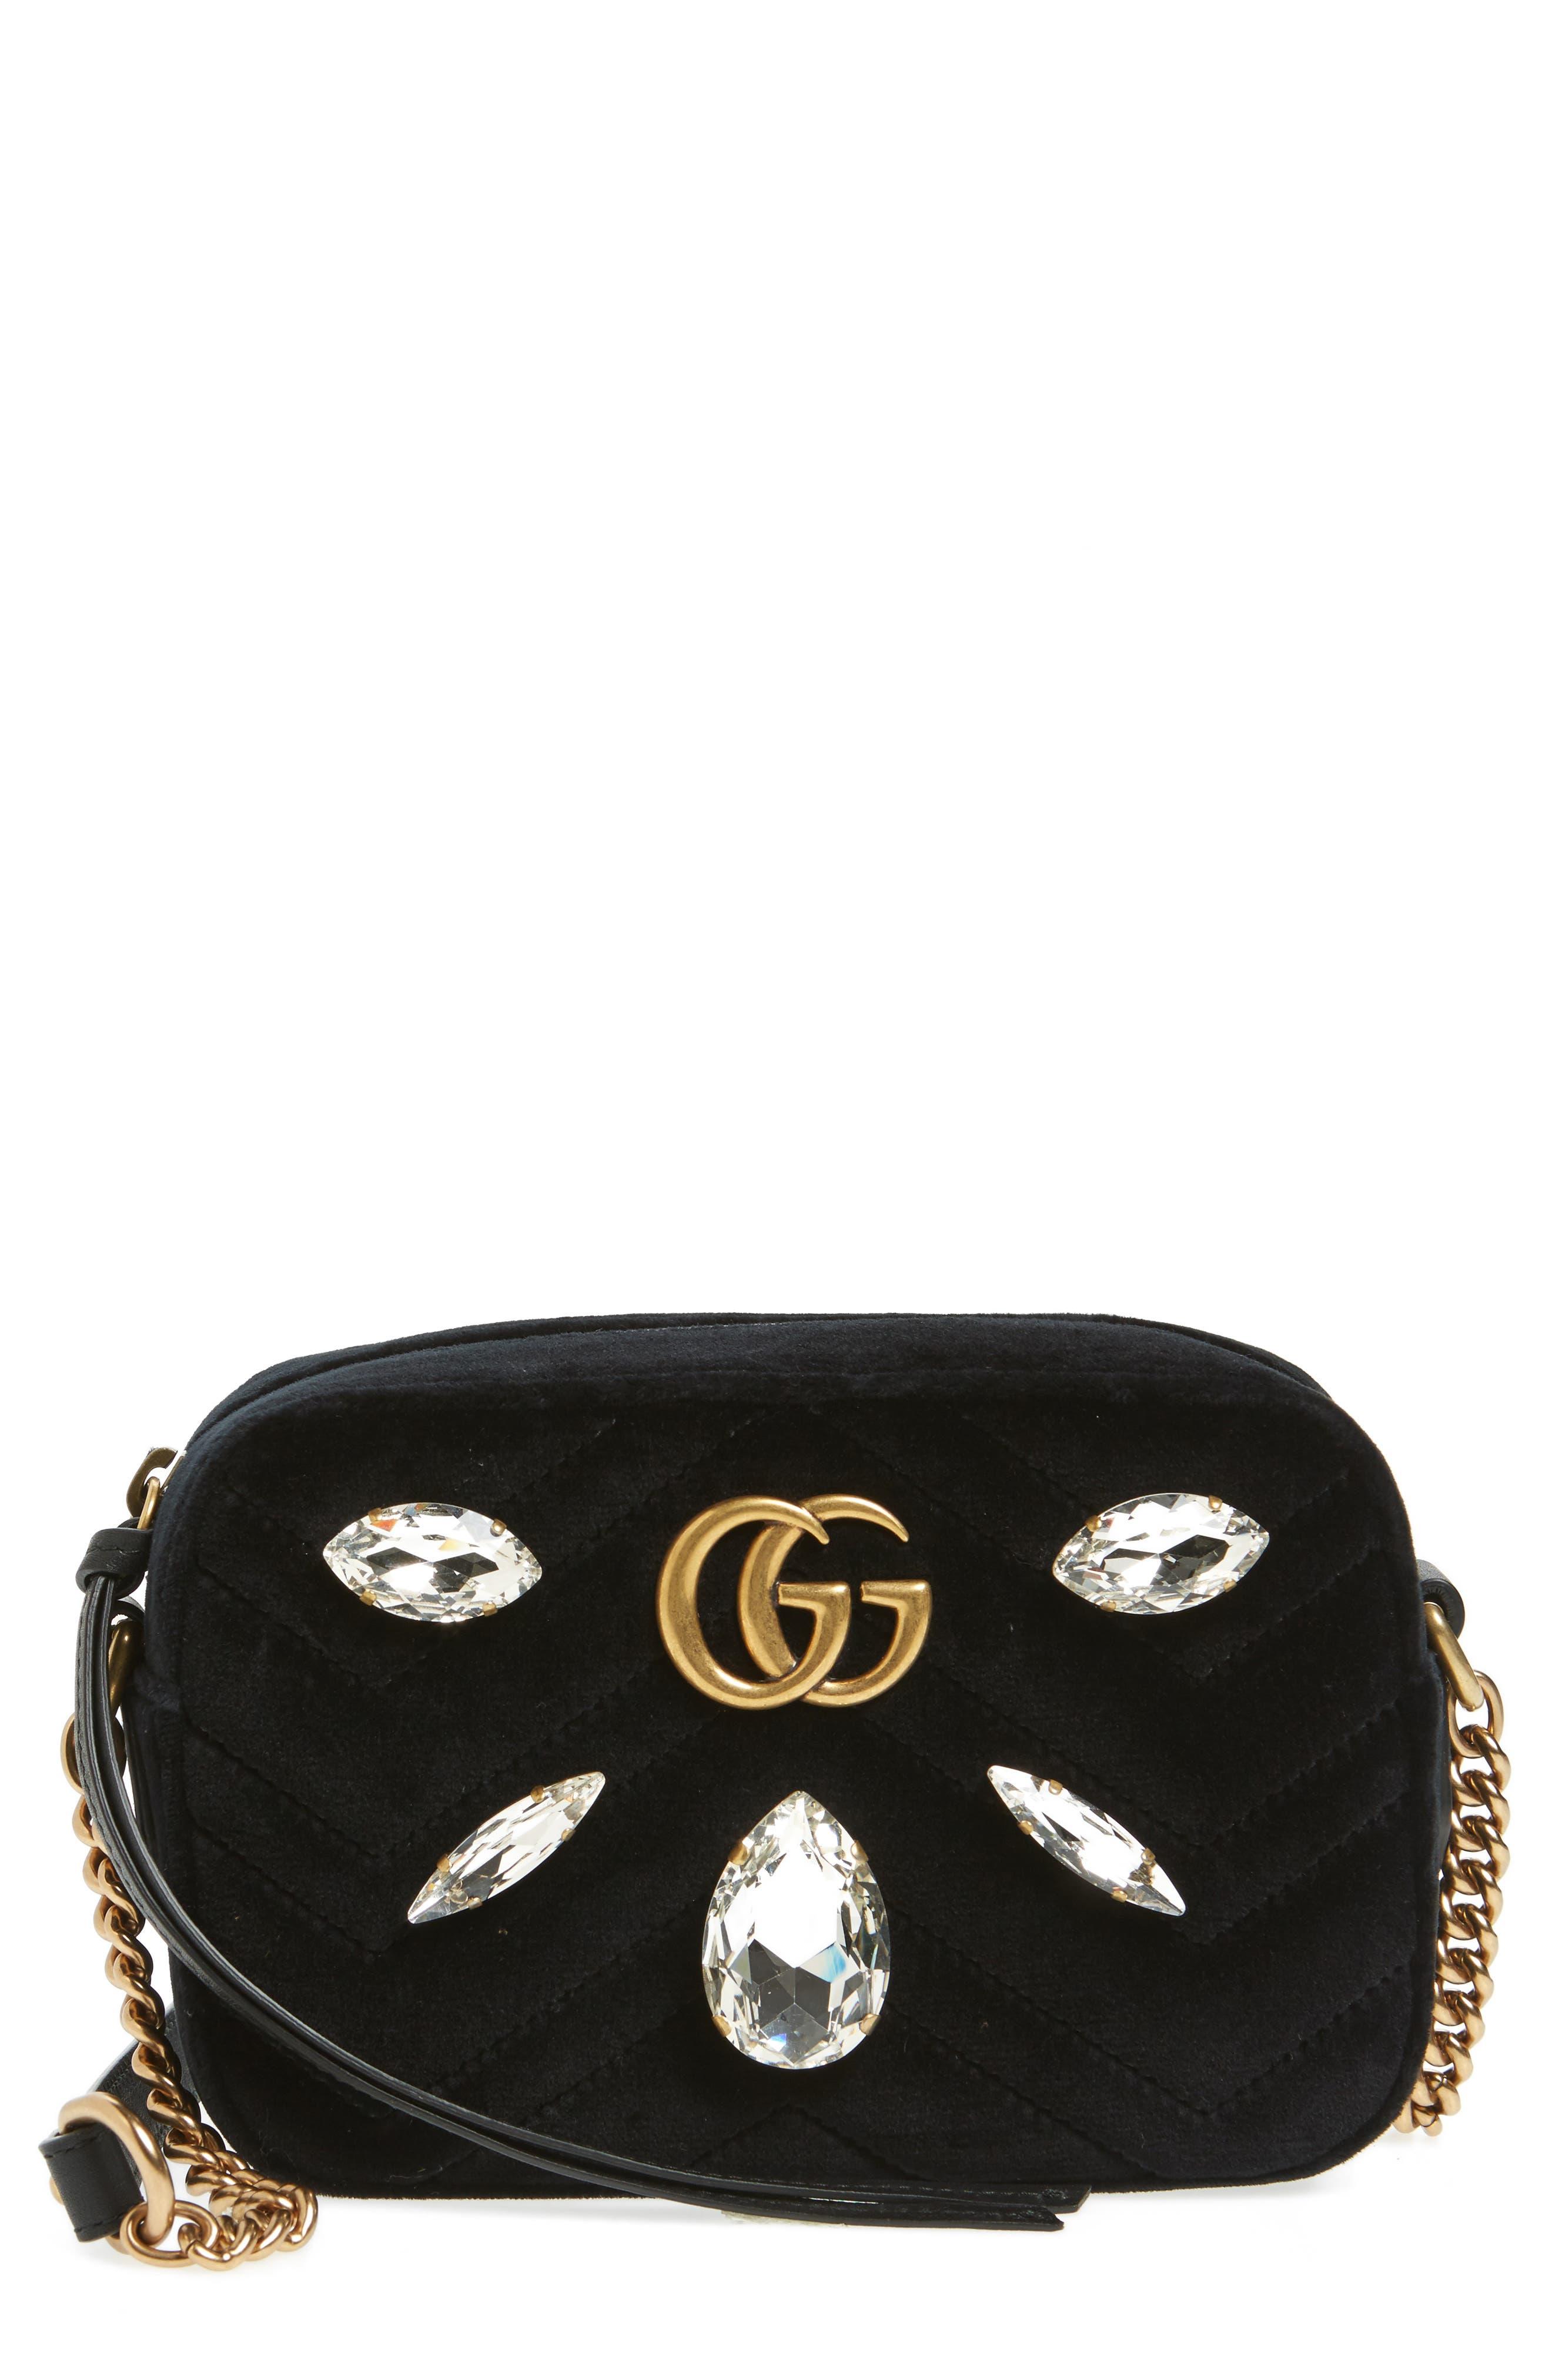 GG Marmont Crystal Matelassé Quilted Velvet Crossbody Bag,                             Main thumbnail 1, color,                             001